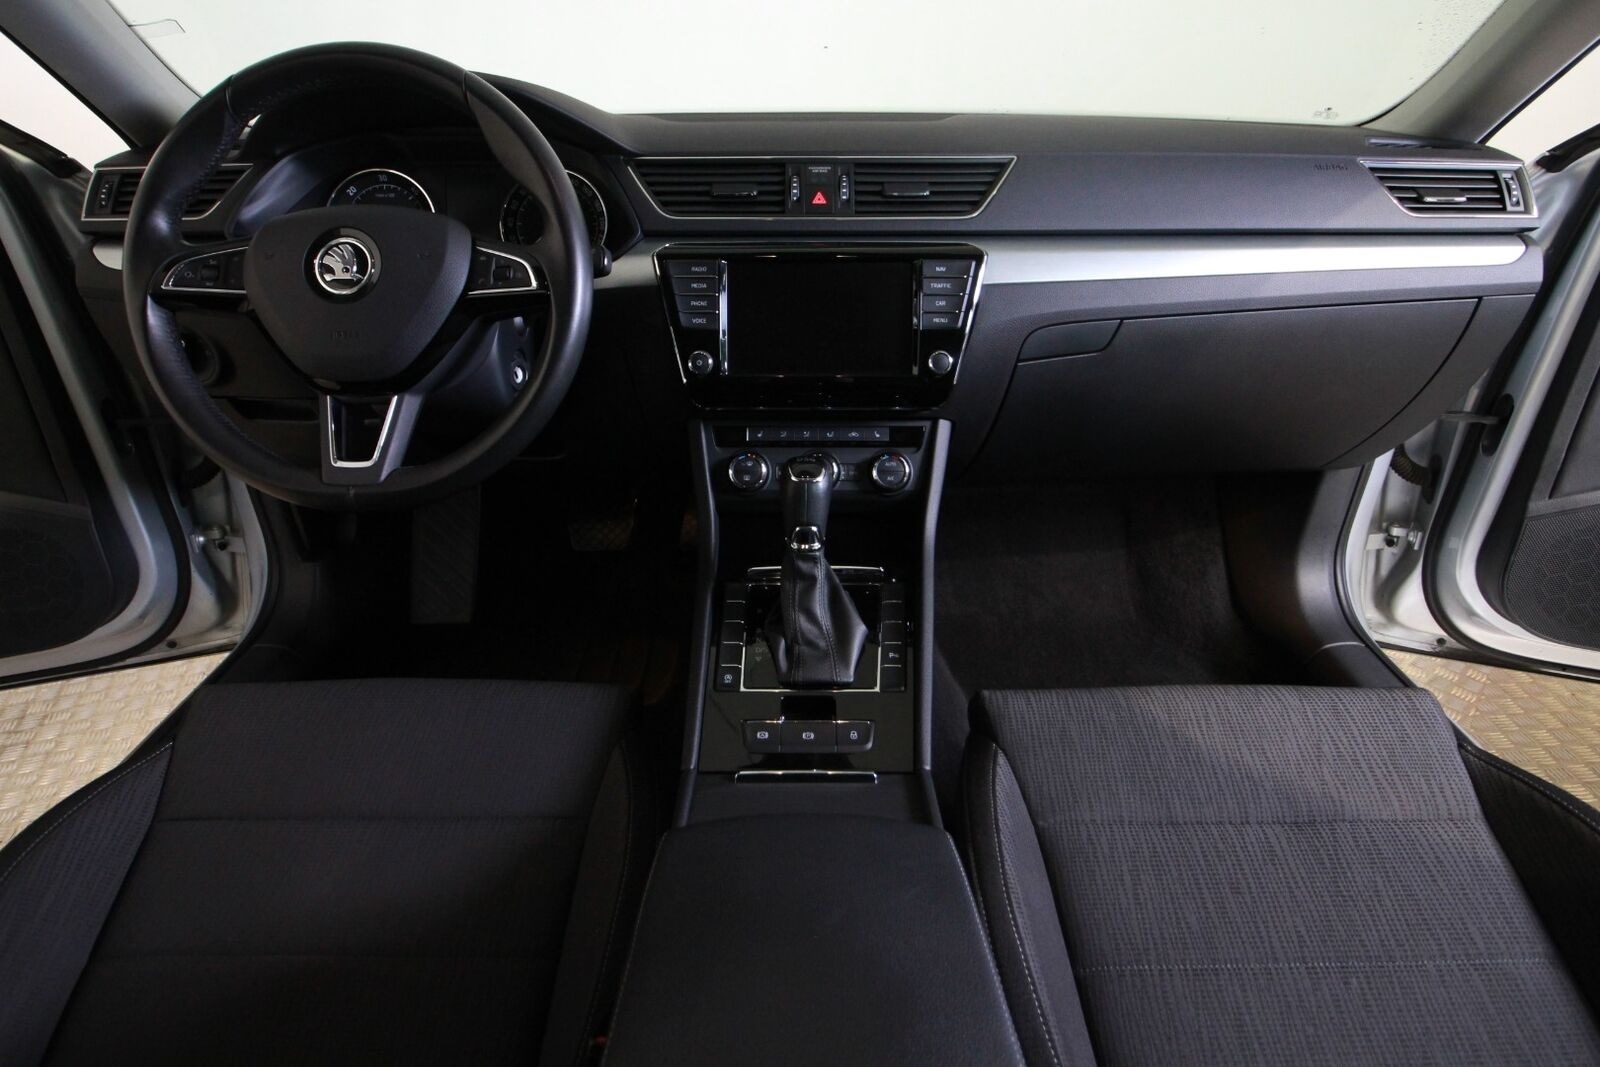 Skoda Superb TDi 150 Ambition Combi DSG